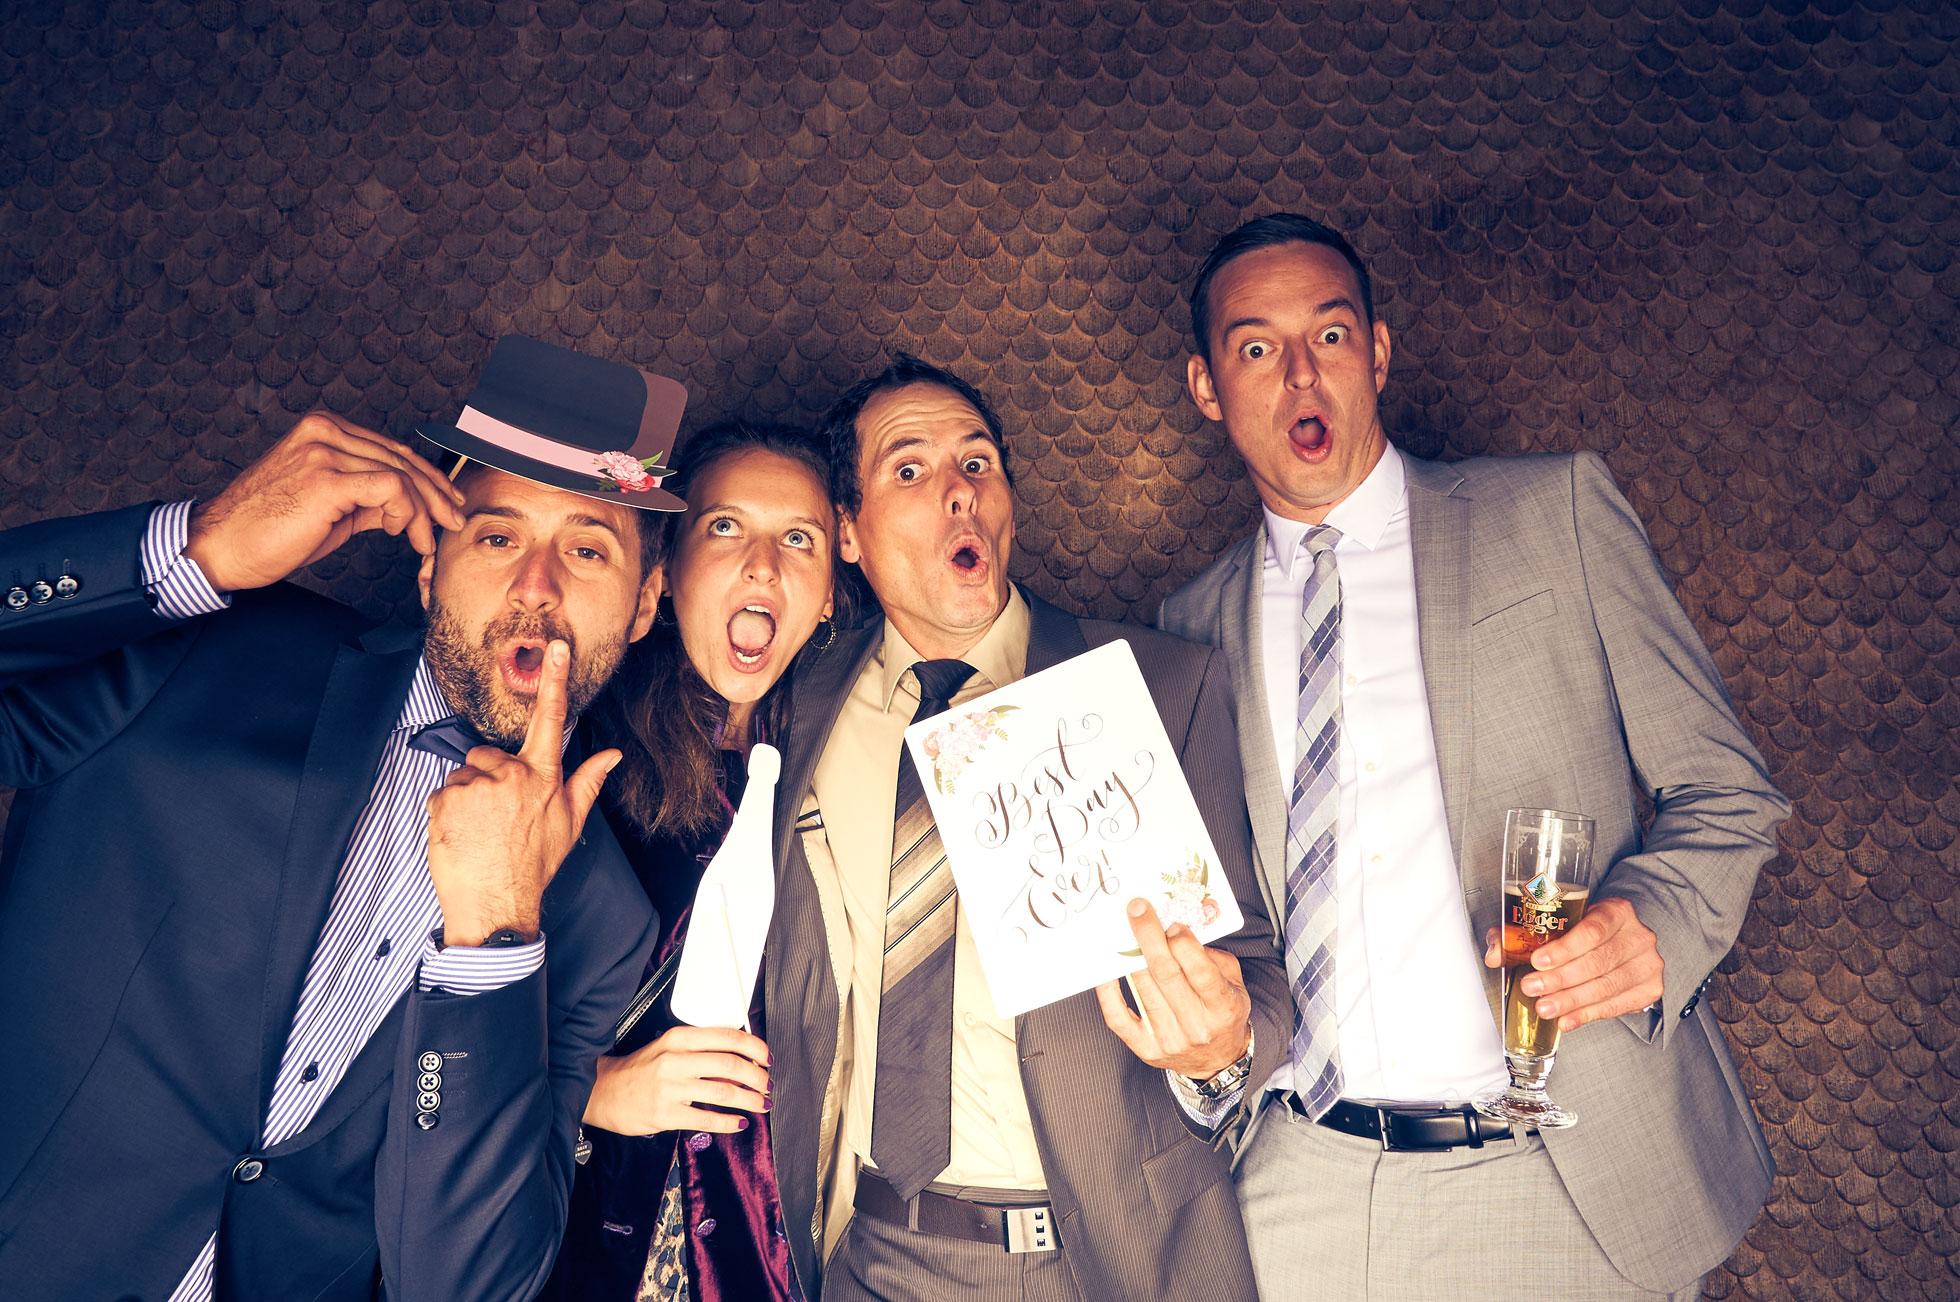 00044_fotomat_0097_hires.jpg